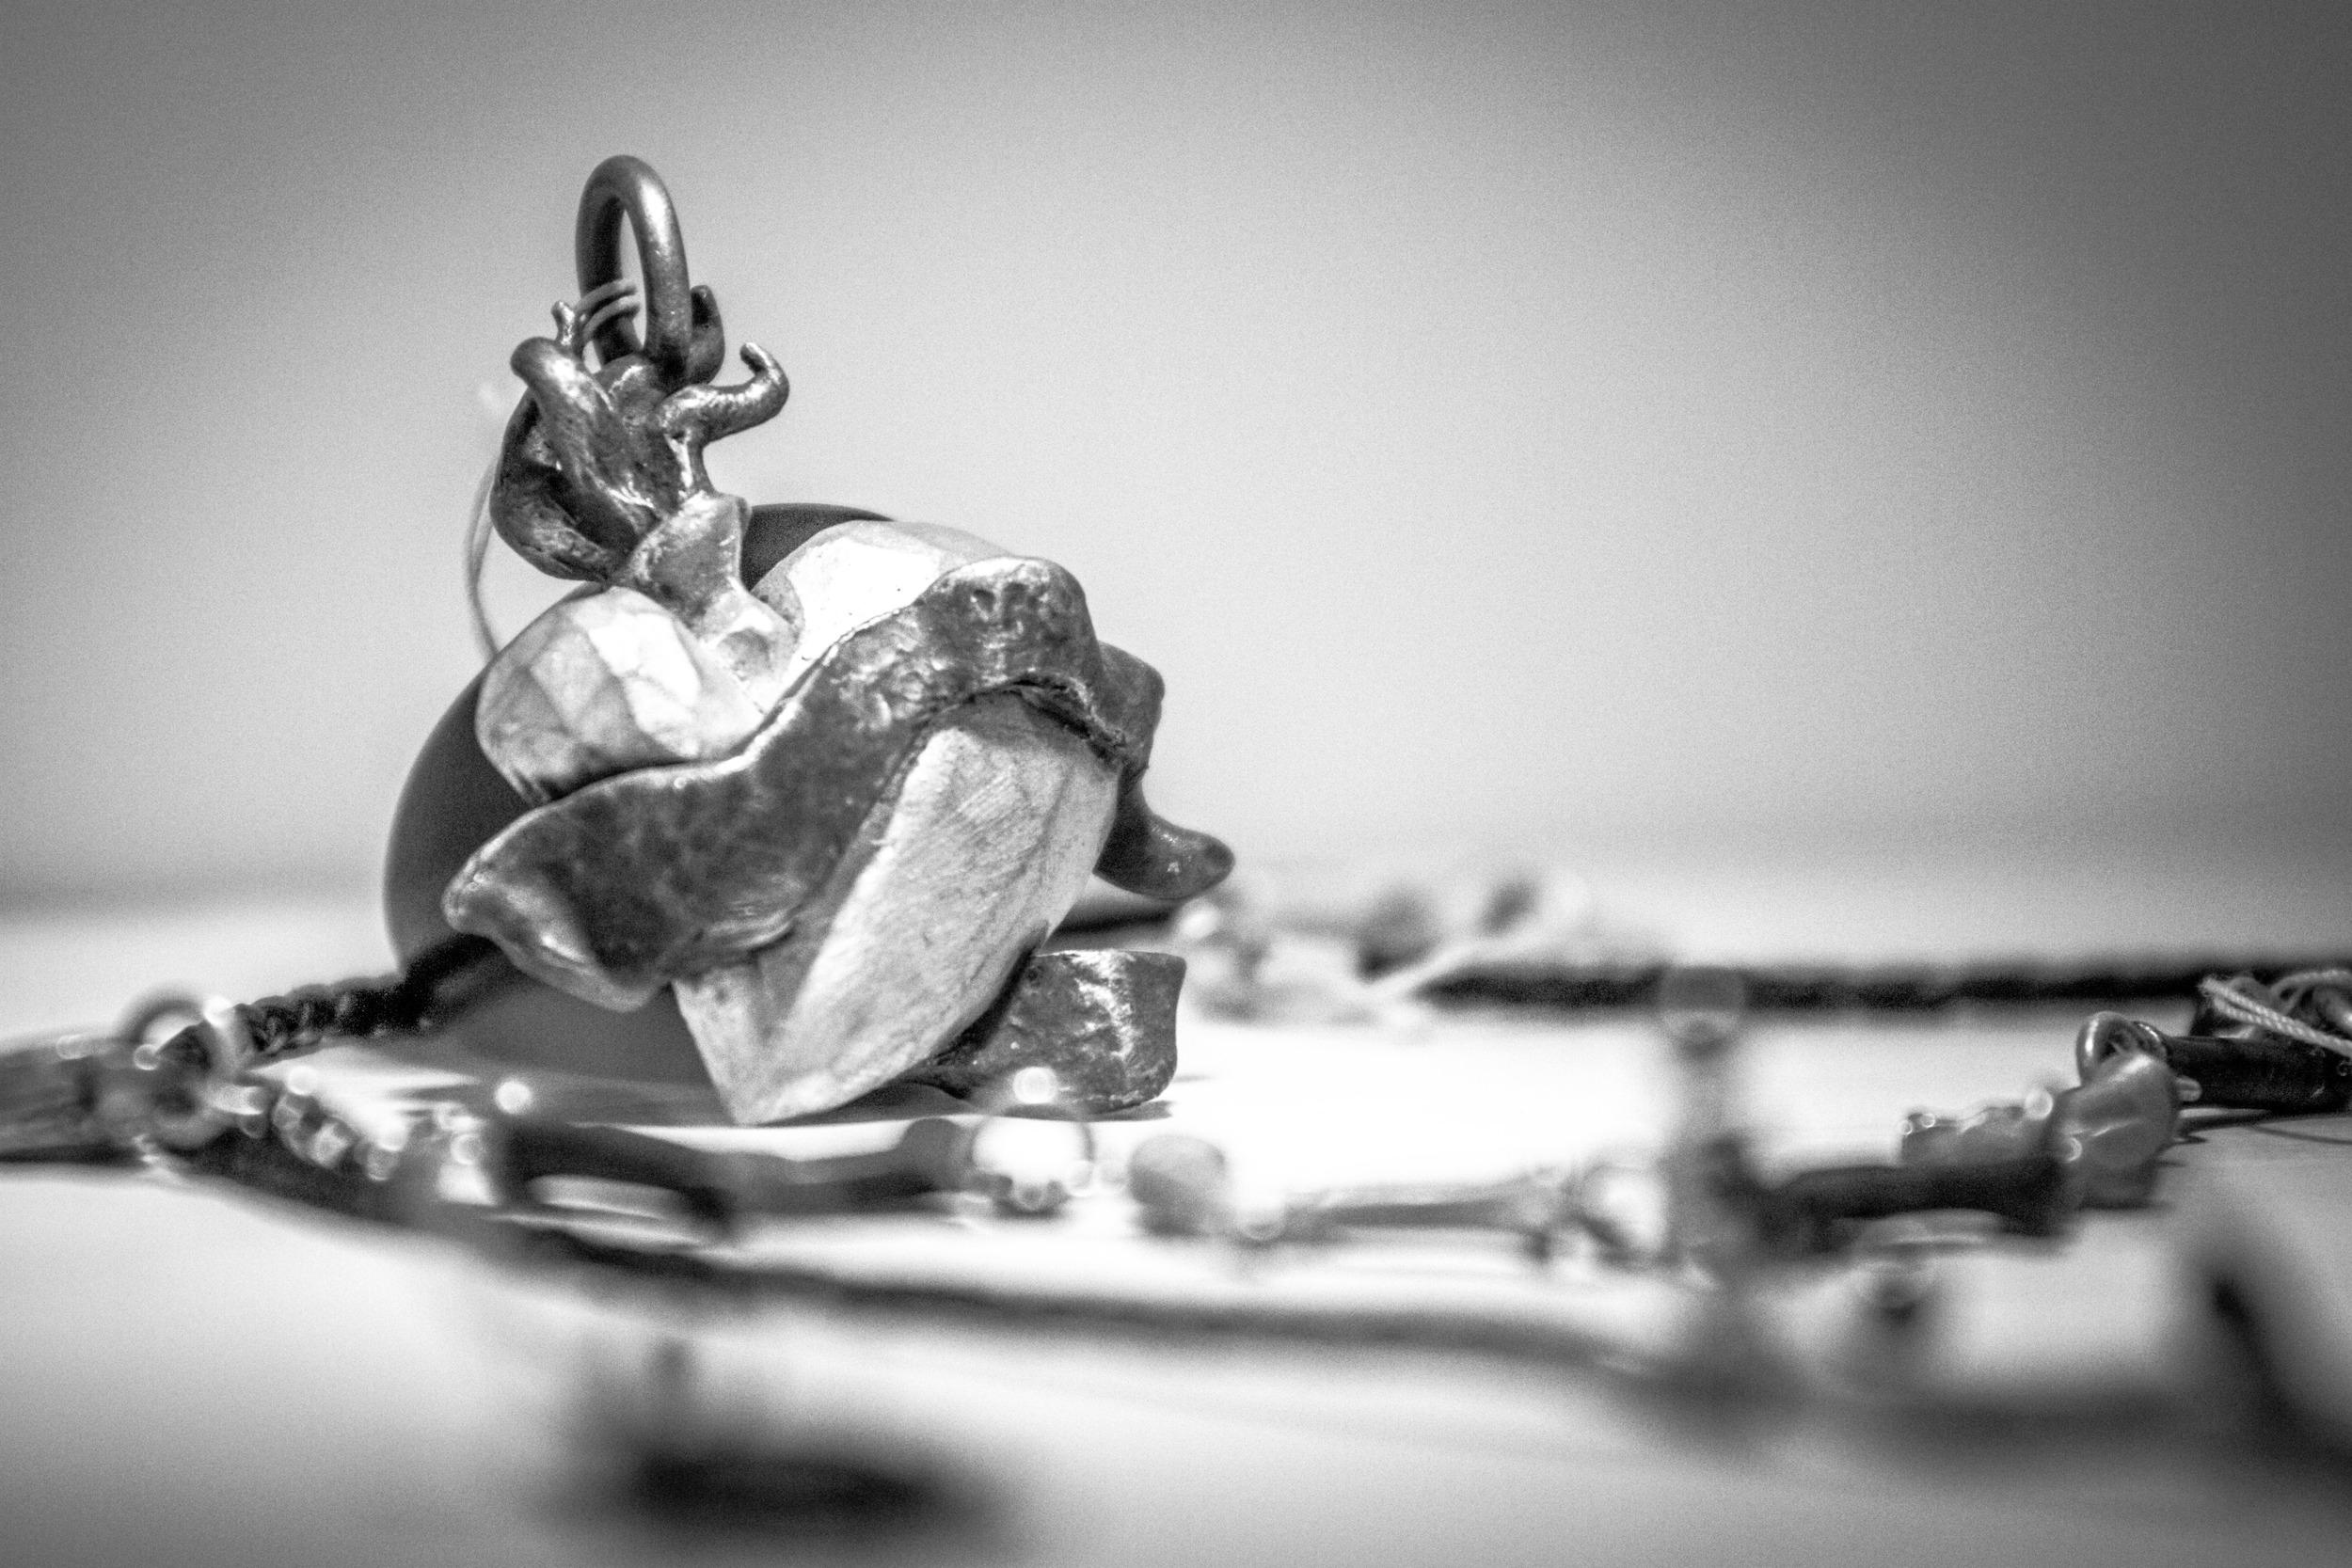 rohstoff by Dirk Behlau-2715.jpg